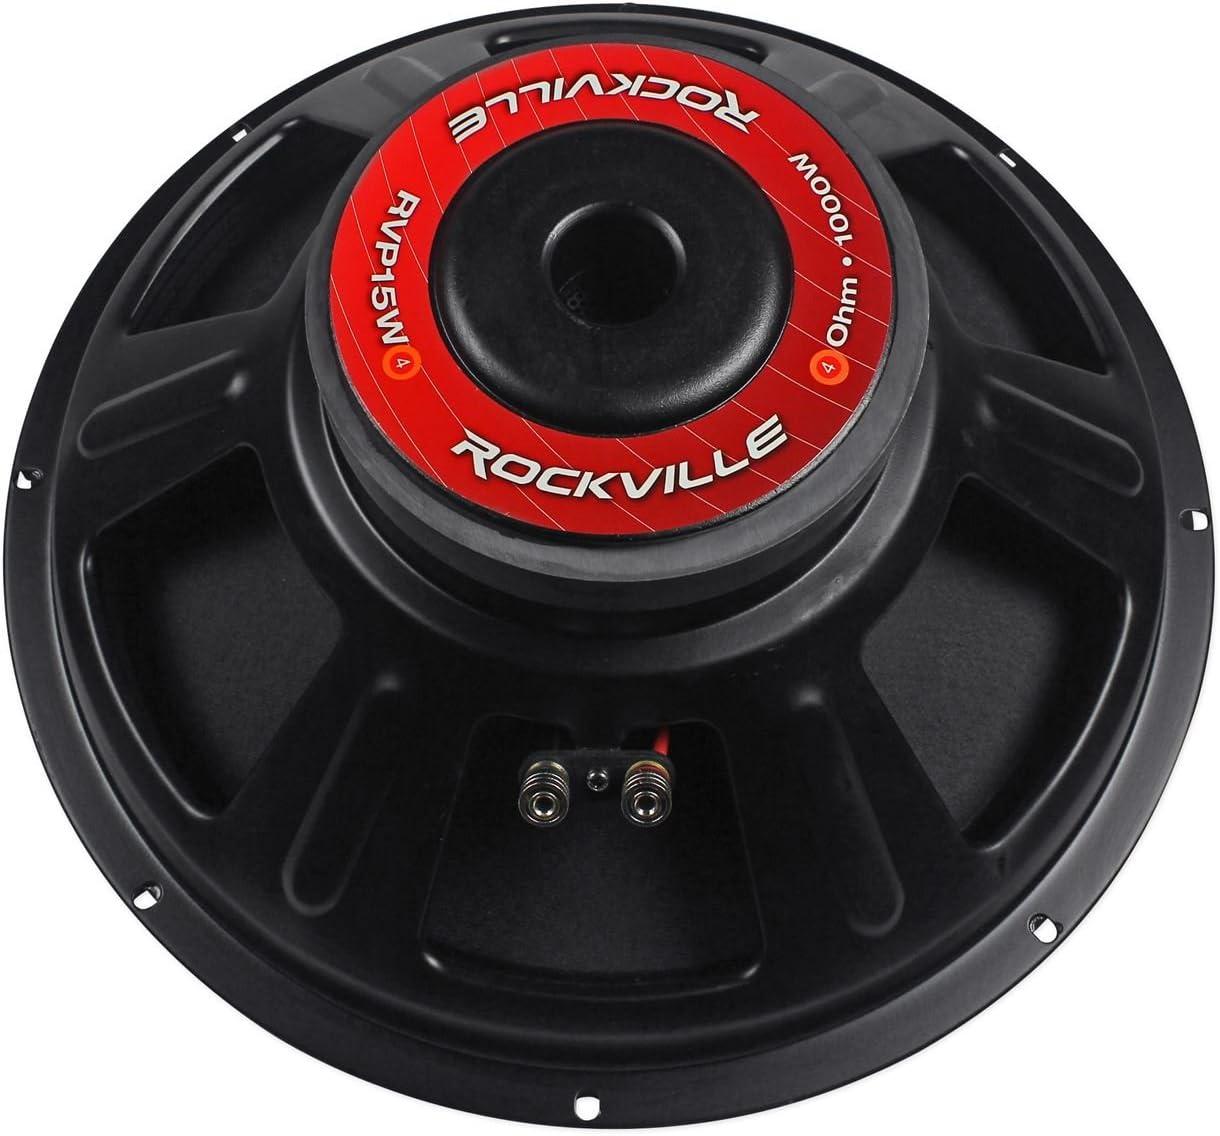 2 New Rockville RVP15W4 2000 Watt 15 Pro Subwoofers 4 Ohm Raw Sub Woofers